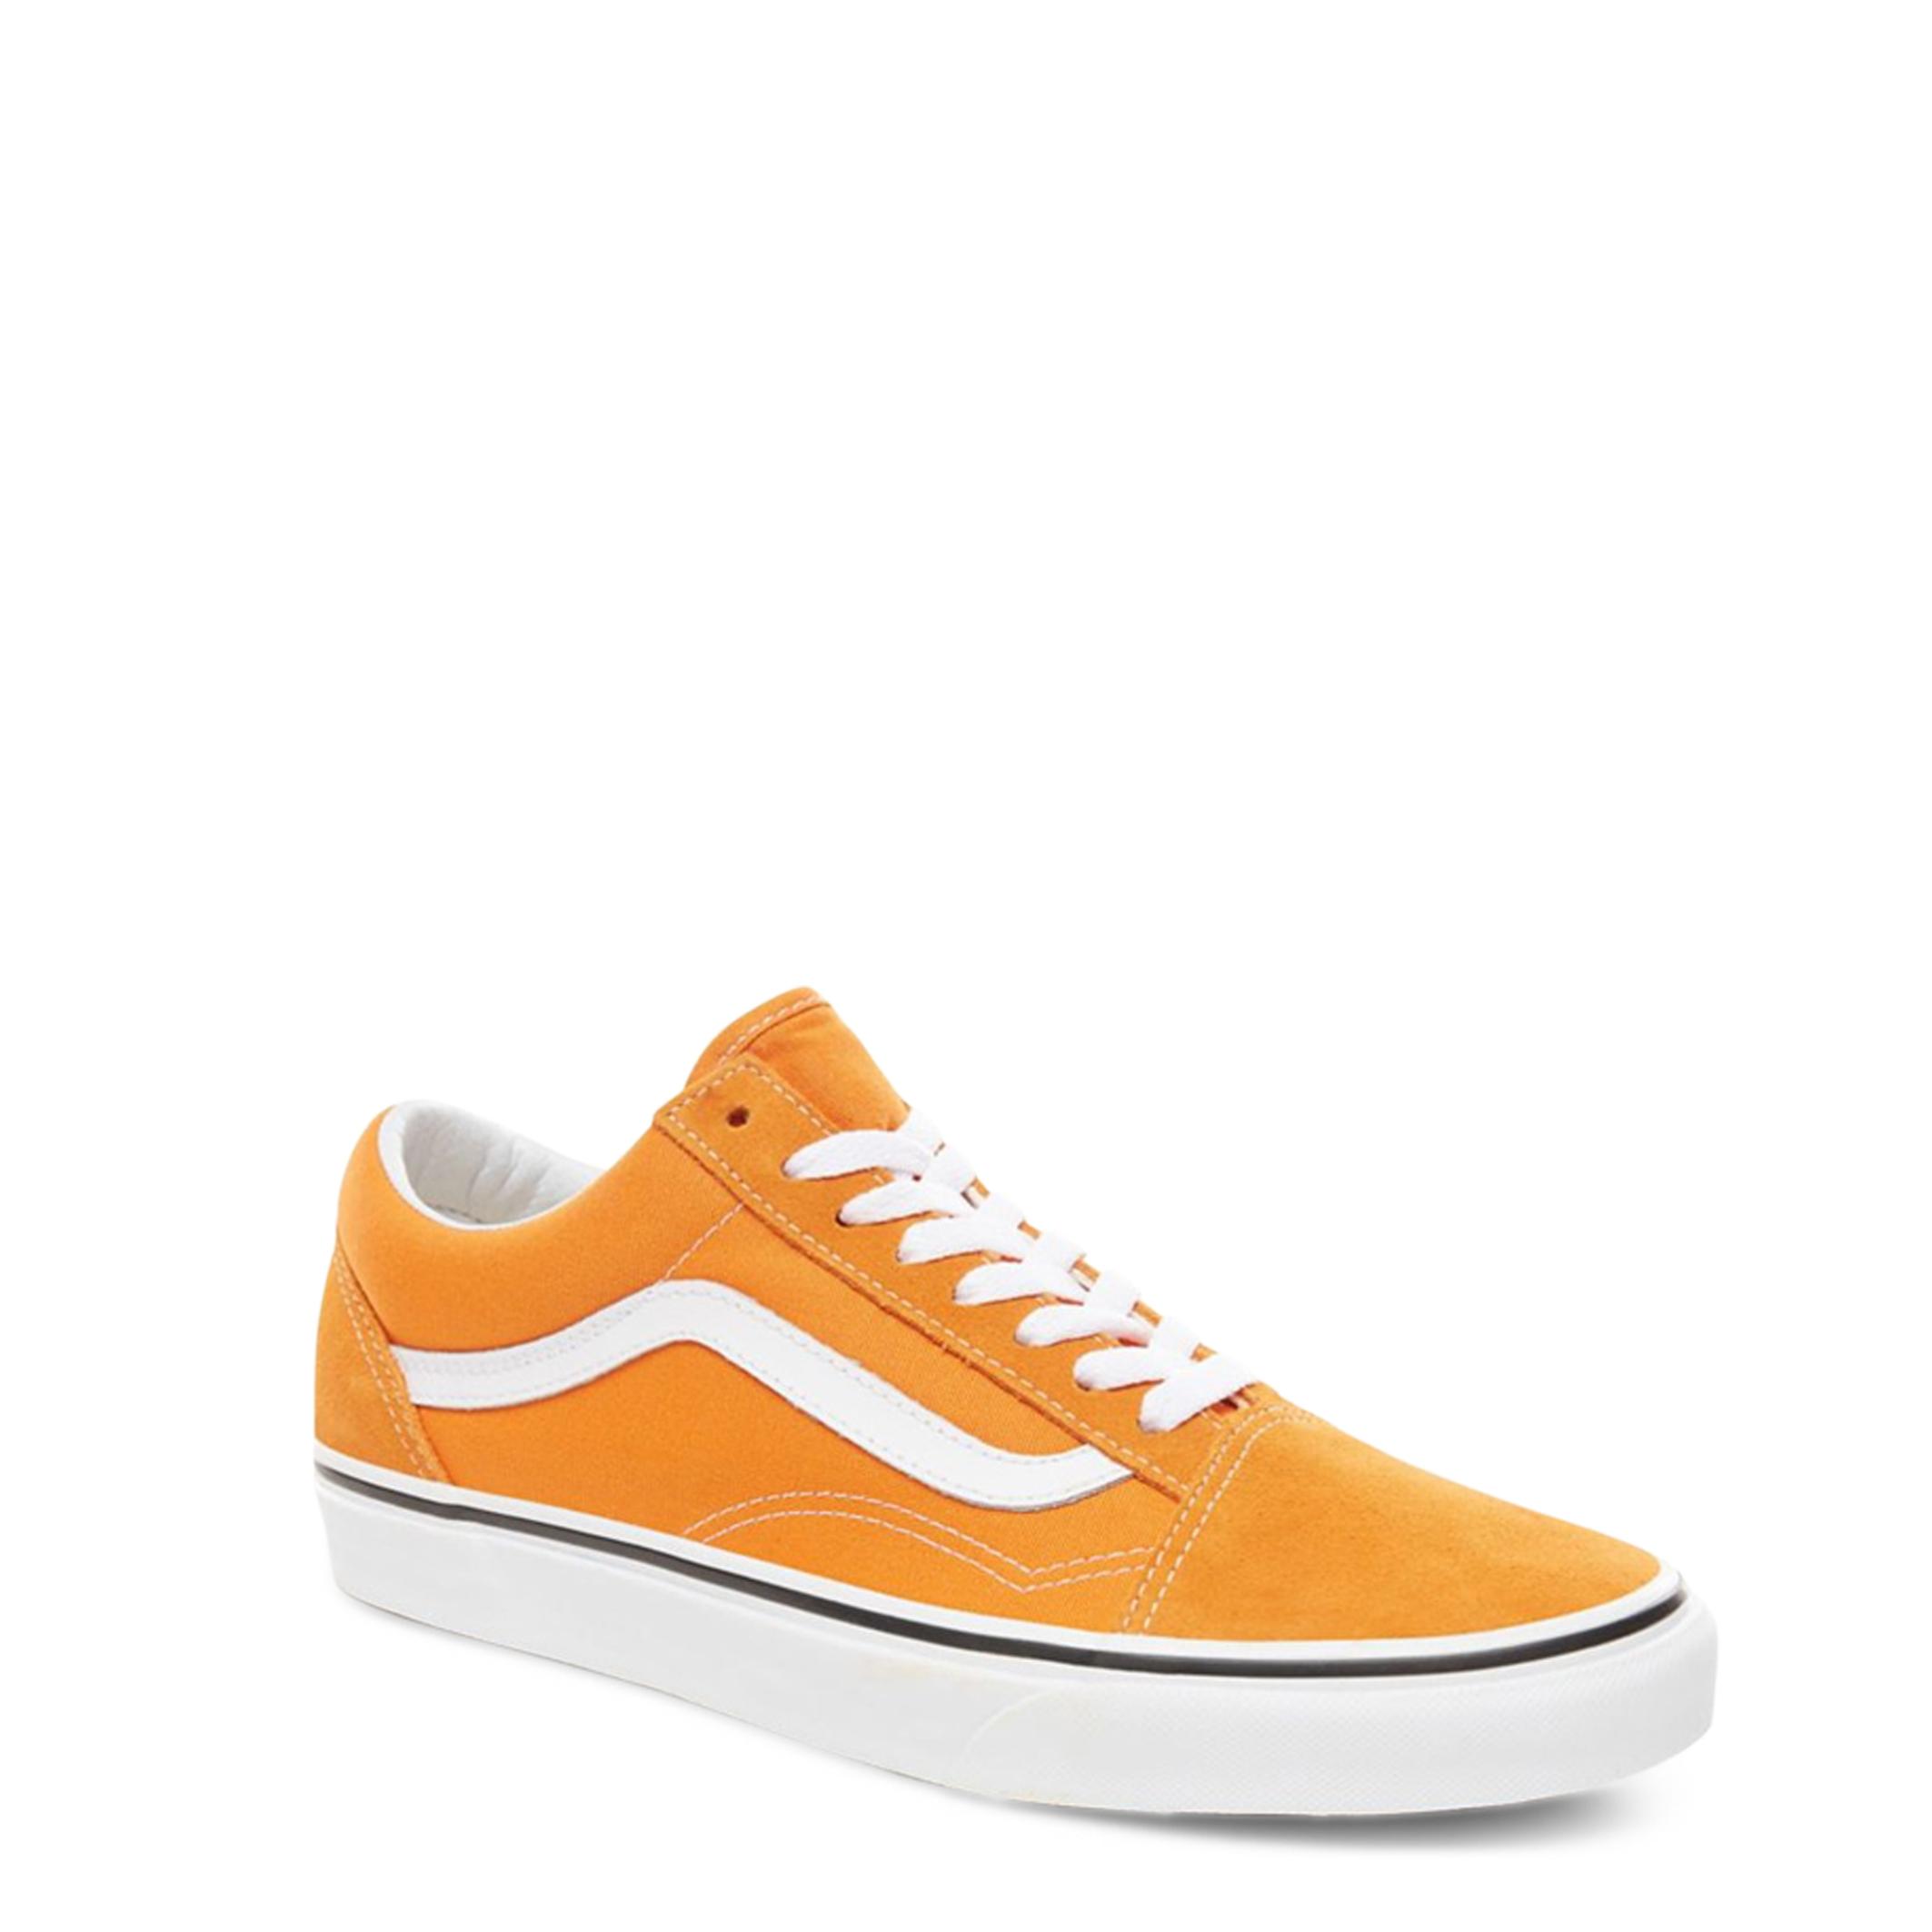 Baskets / Sport  Vans OLD-SKOOL yellow